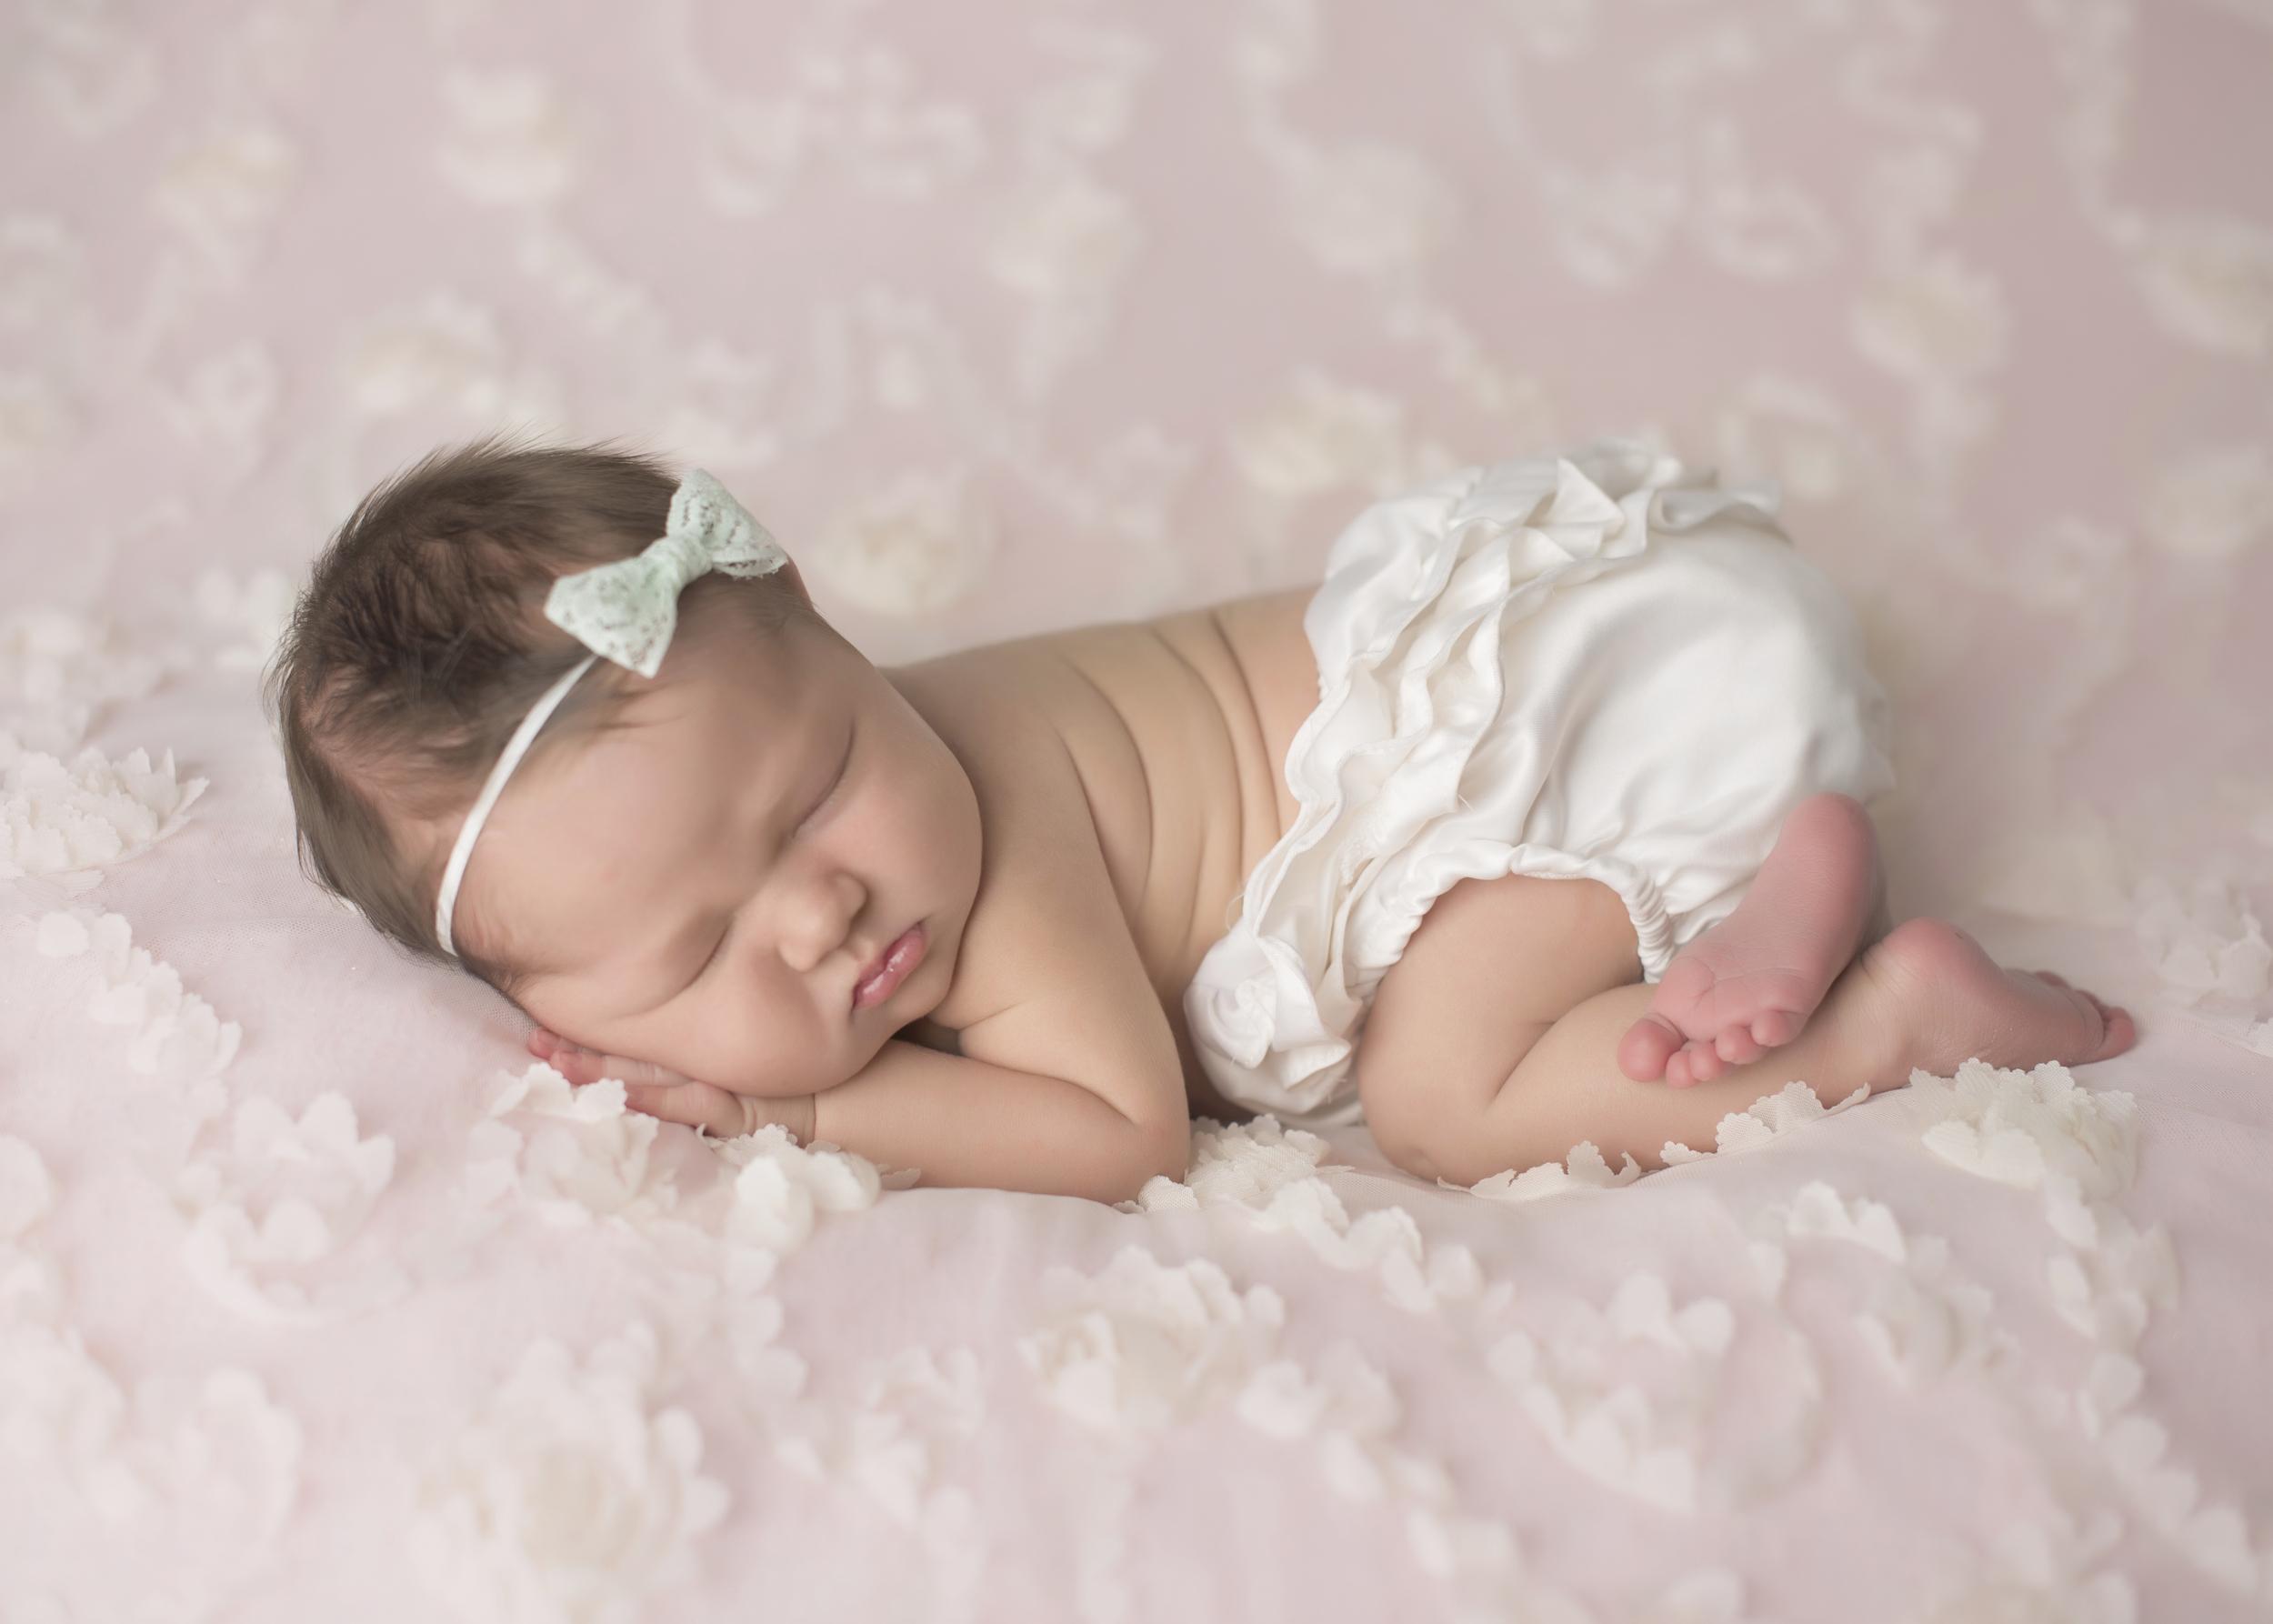 Gwen_Newborn_001.jpg